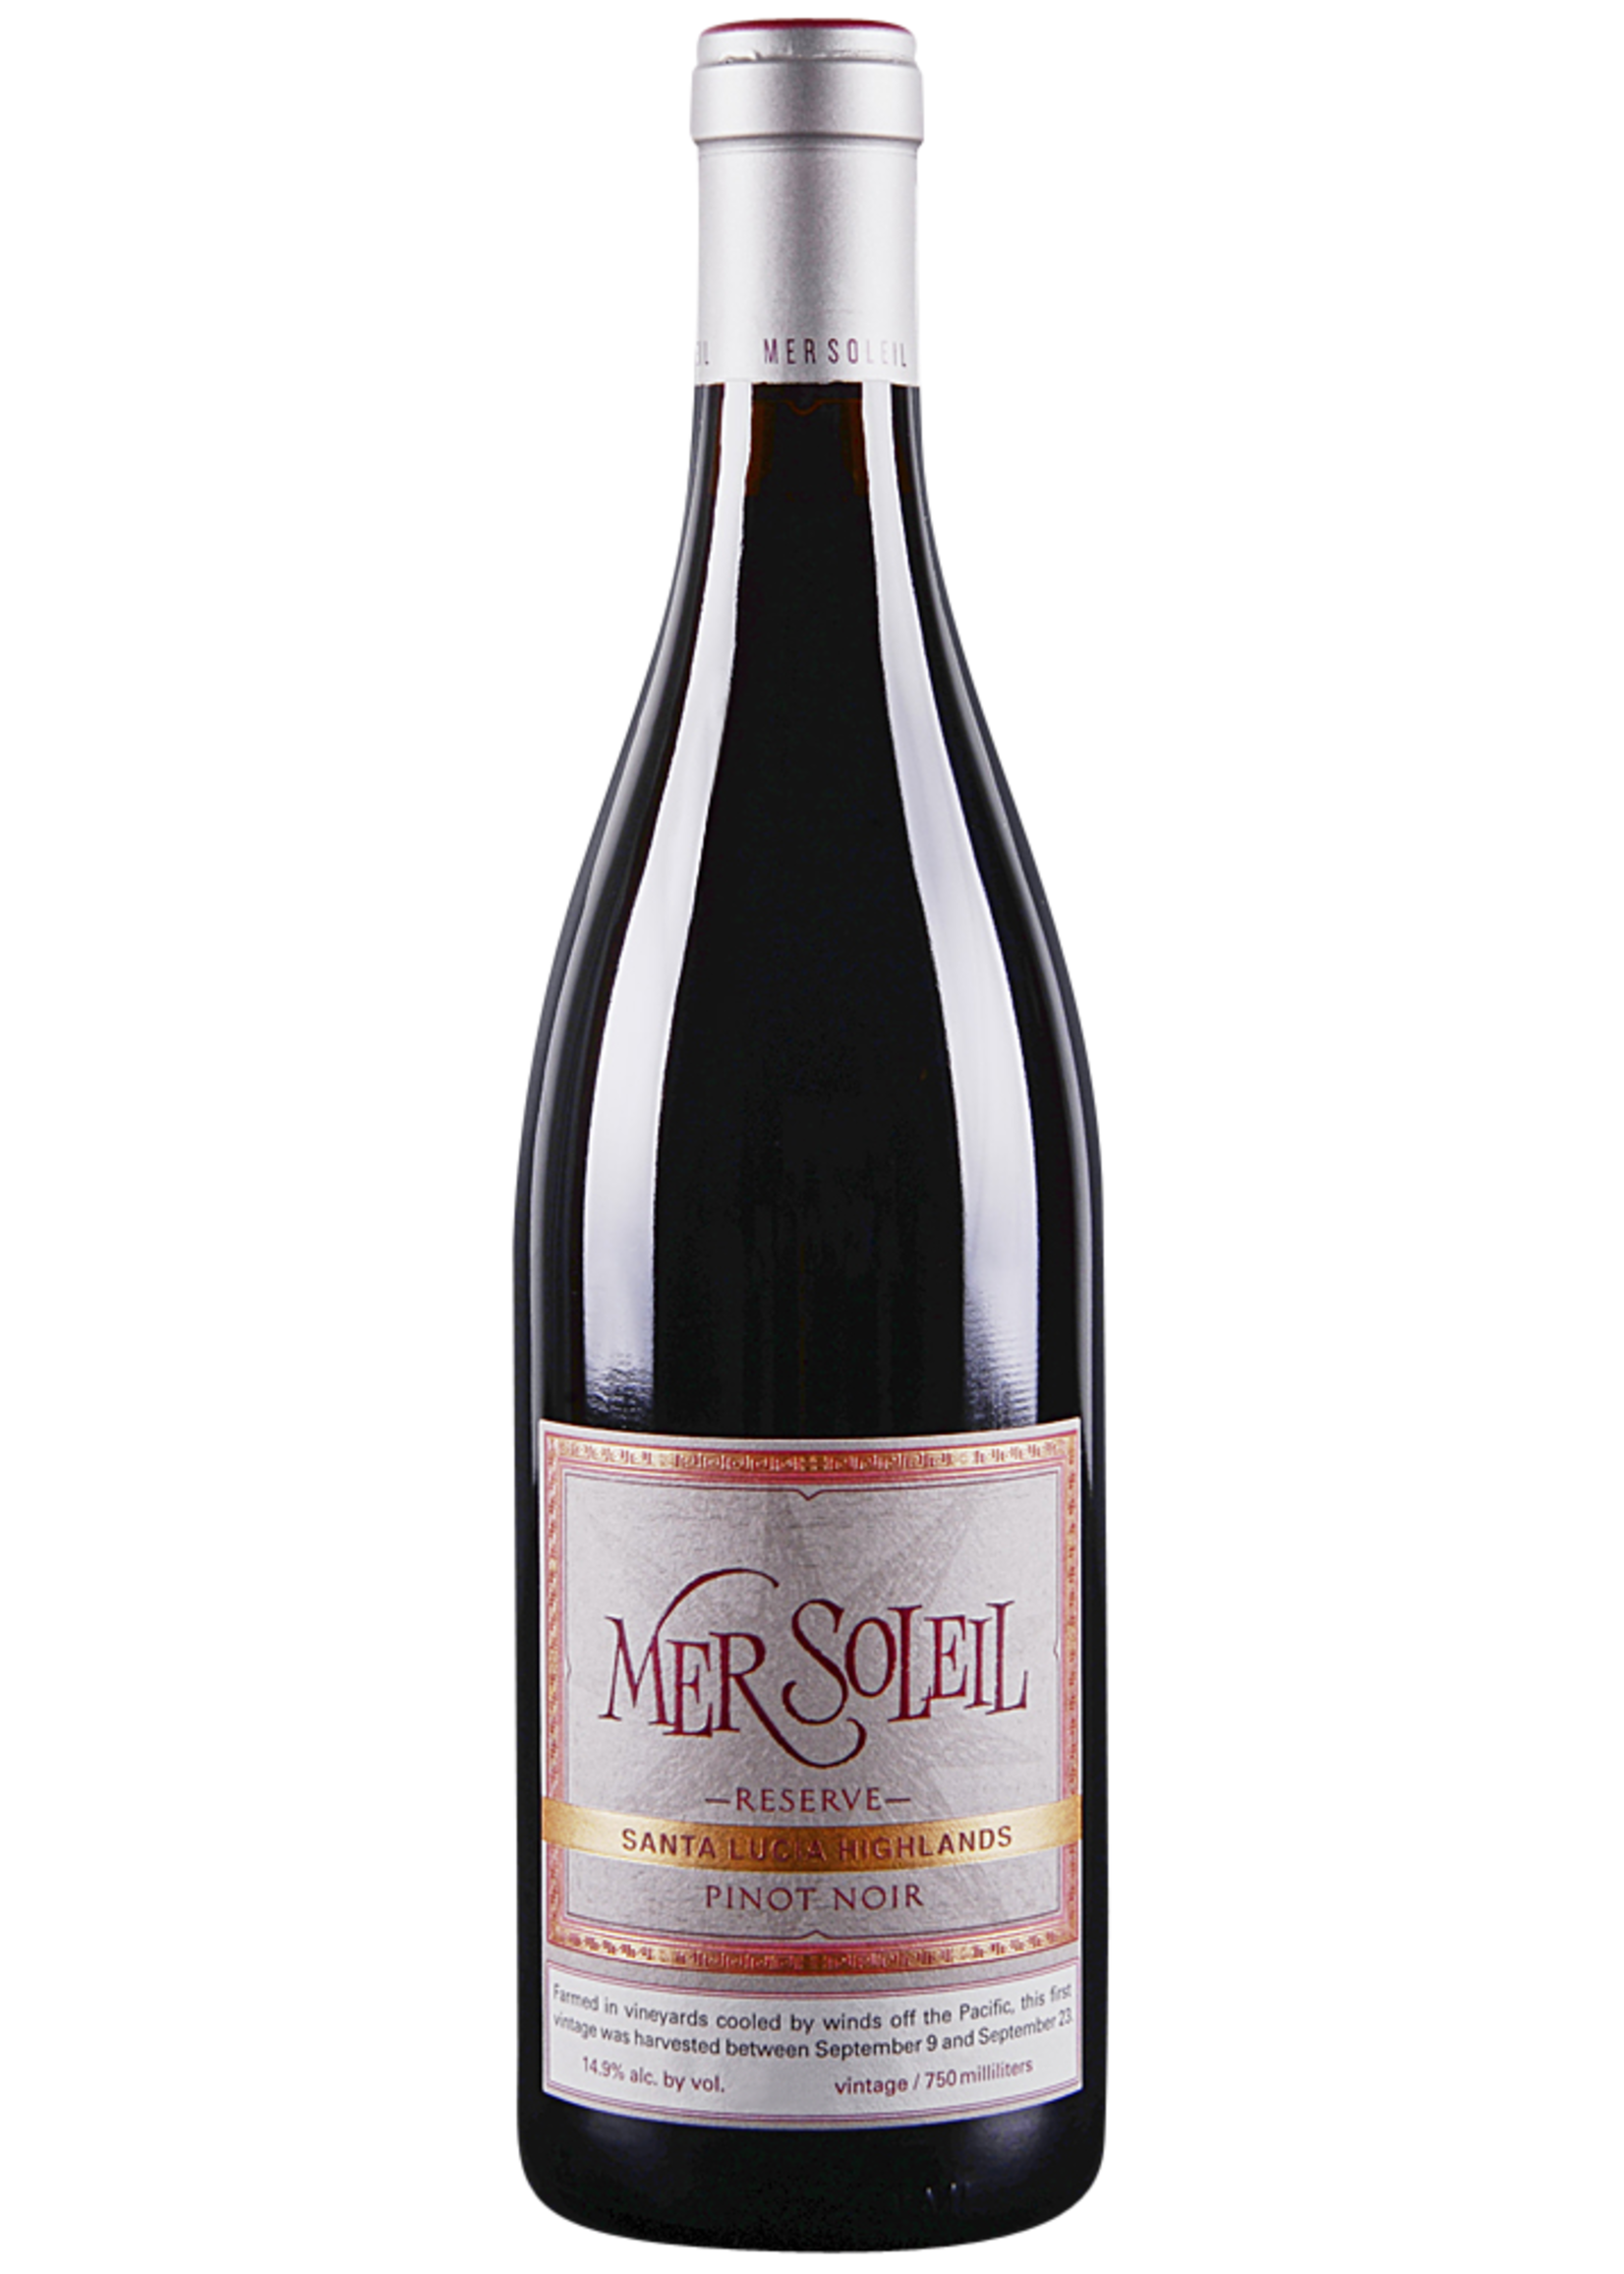 Mer Soleil Reserv Pinot Noir by Camus, Santa Lucia Highlands, CA